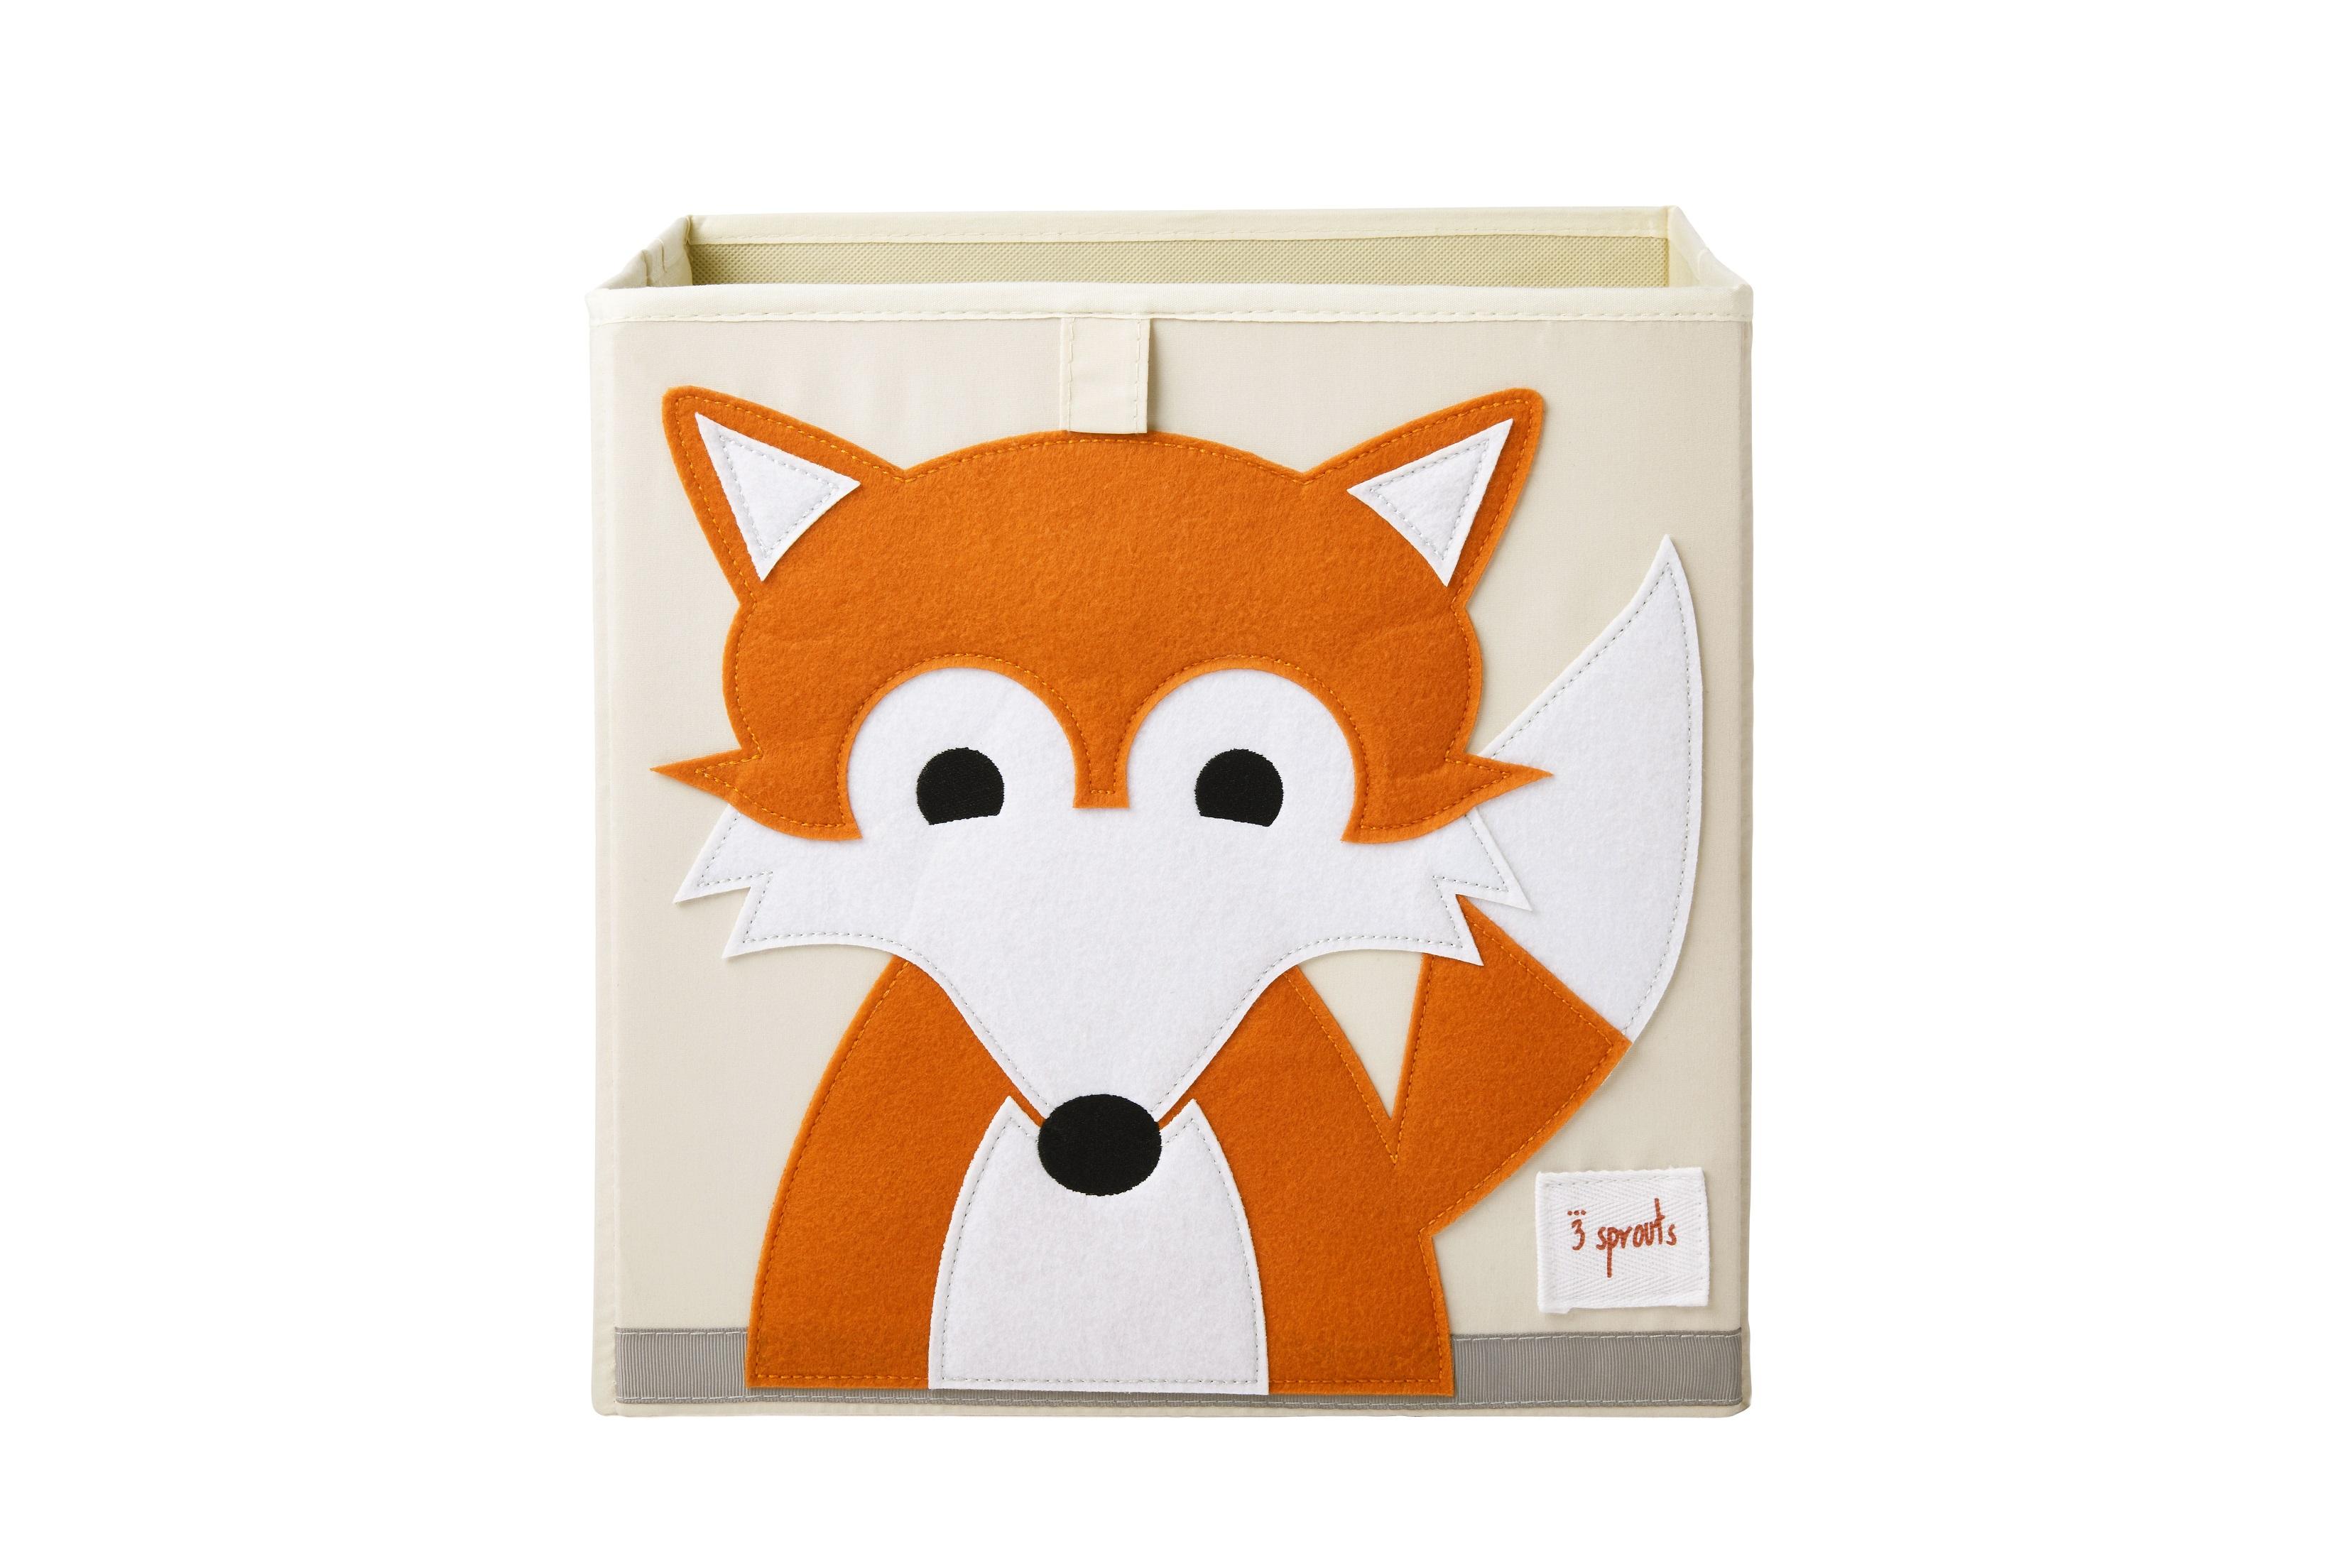 3 Sprouts - Storage Box - Orange Fox